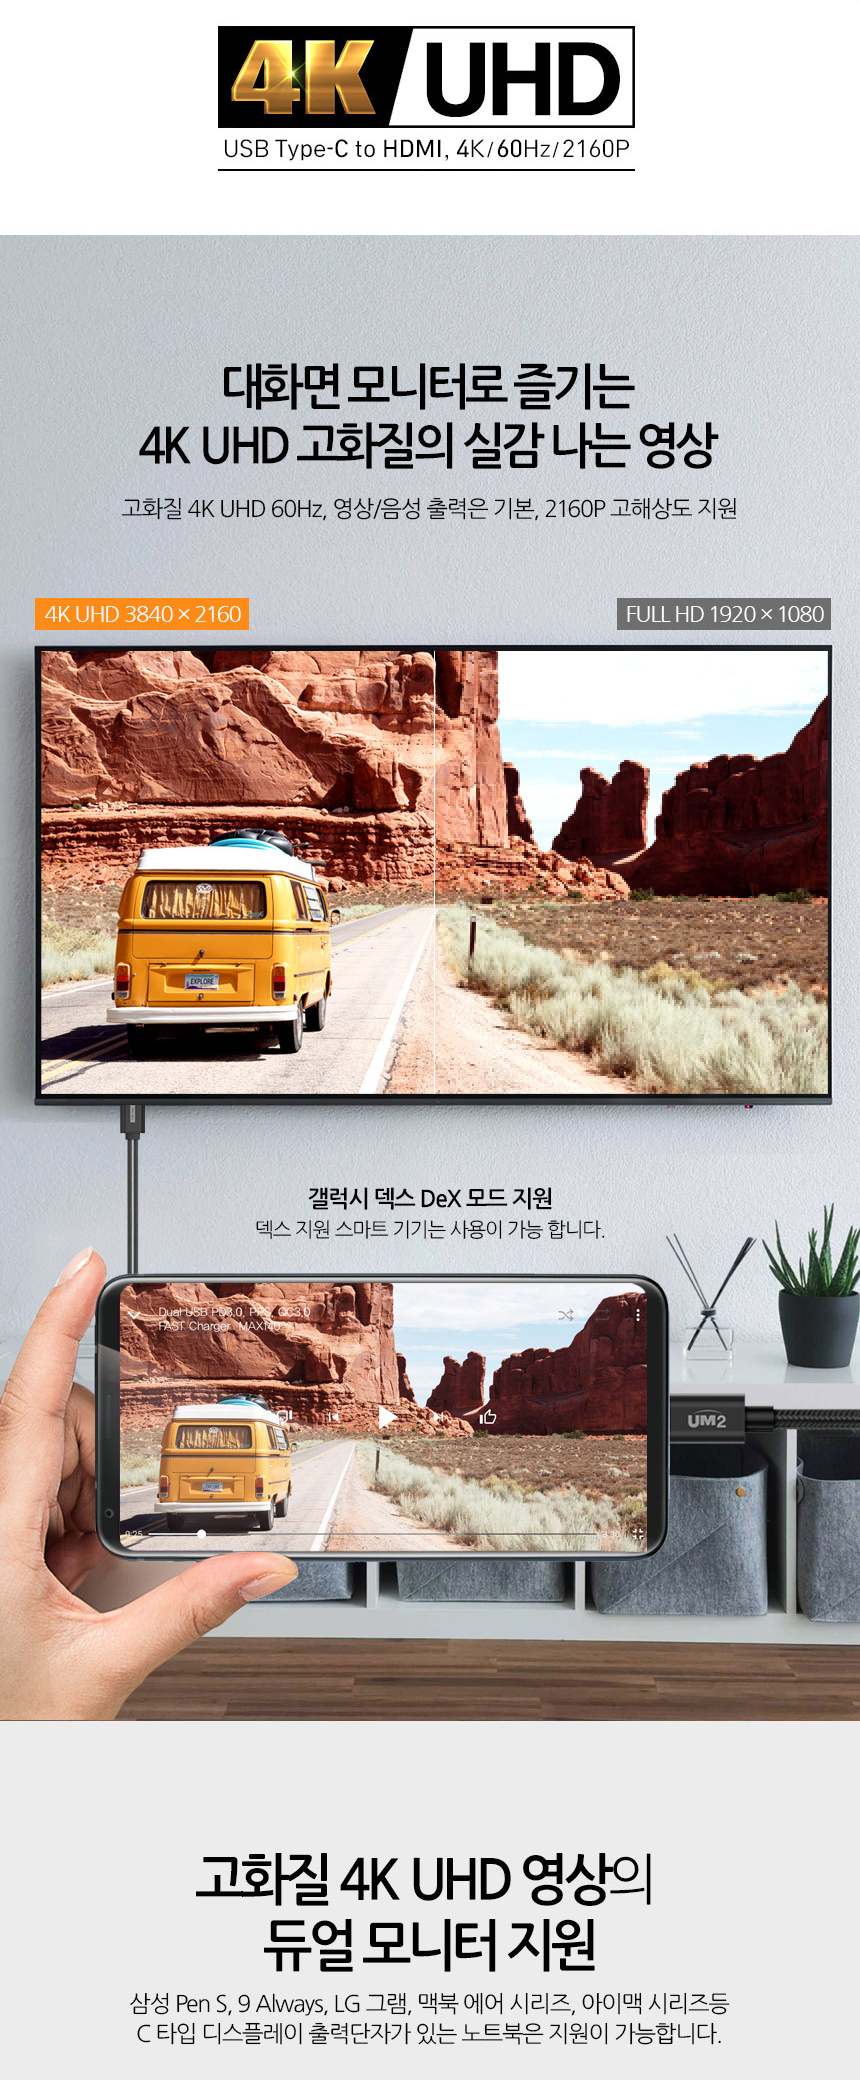 UM2 USB 3.1 타입C to HDMI MHL 스마트폰TV 연결 충전 미러링 케이블 - 에스엔, 35,700원, 케이블, C타입